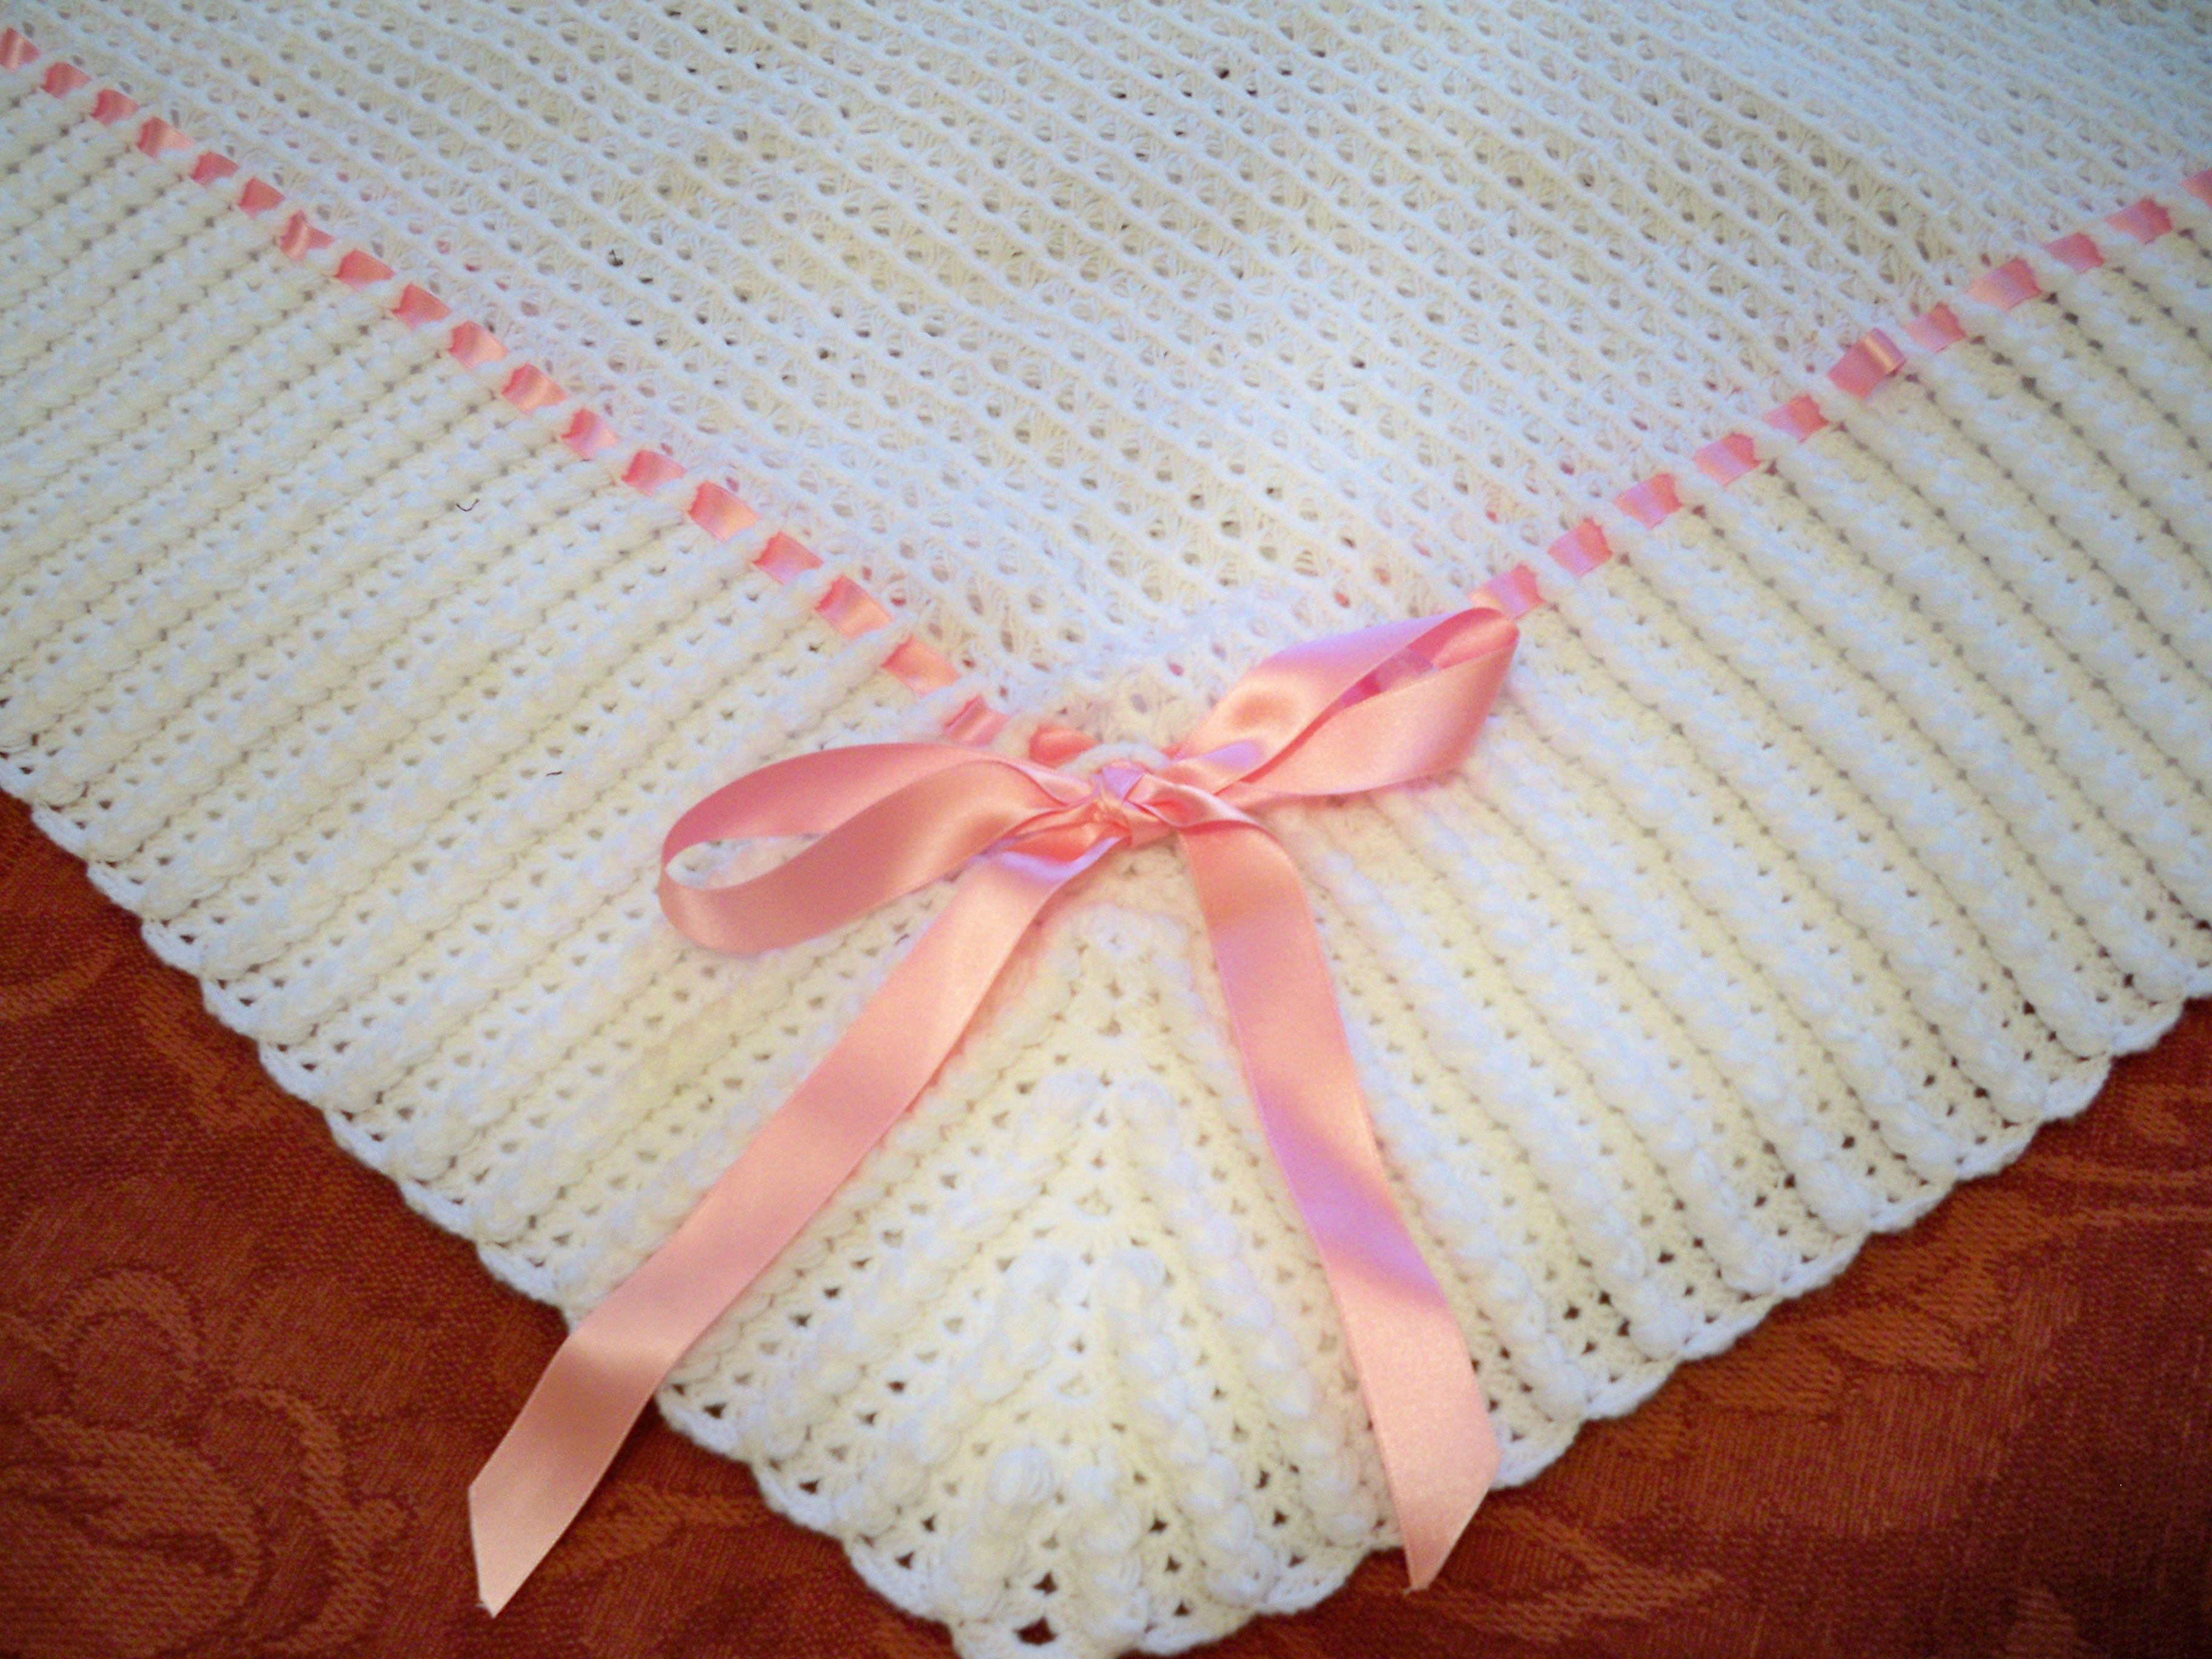 Toquilla para bebe | blankets | Pinterest | Crochet, Crochet baby ...